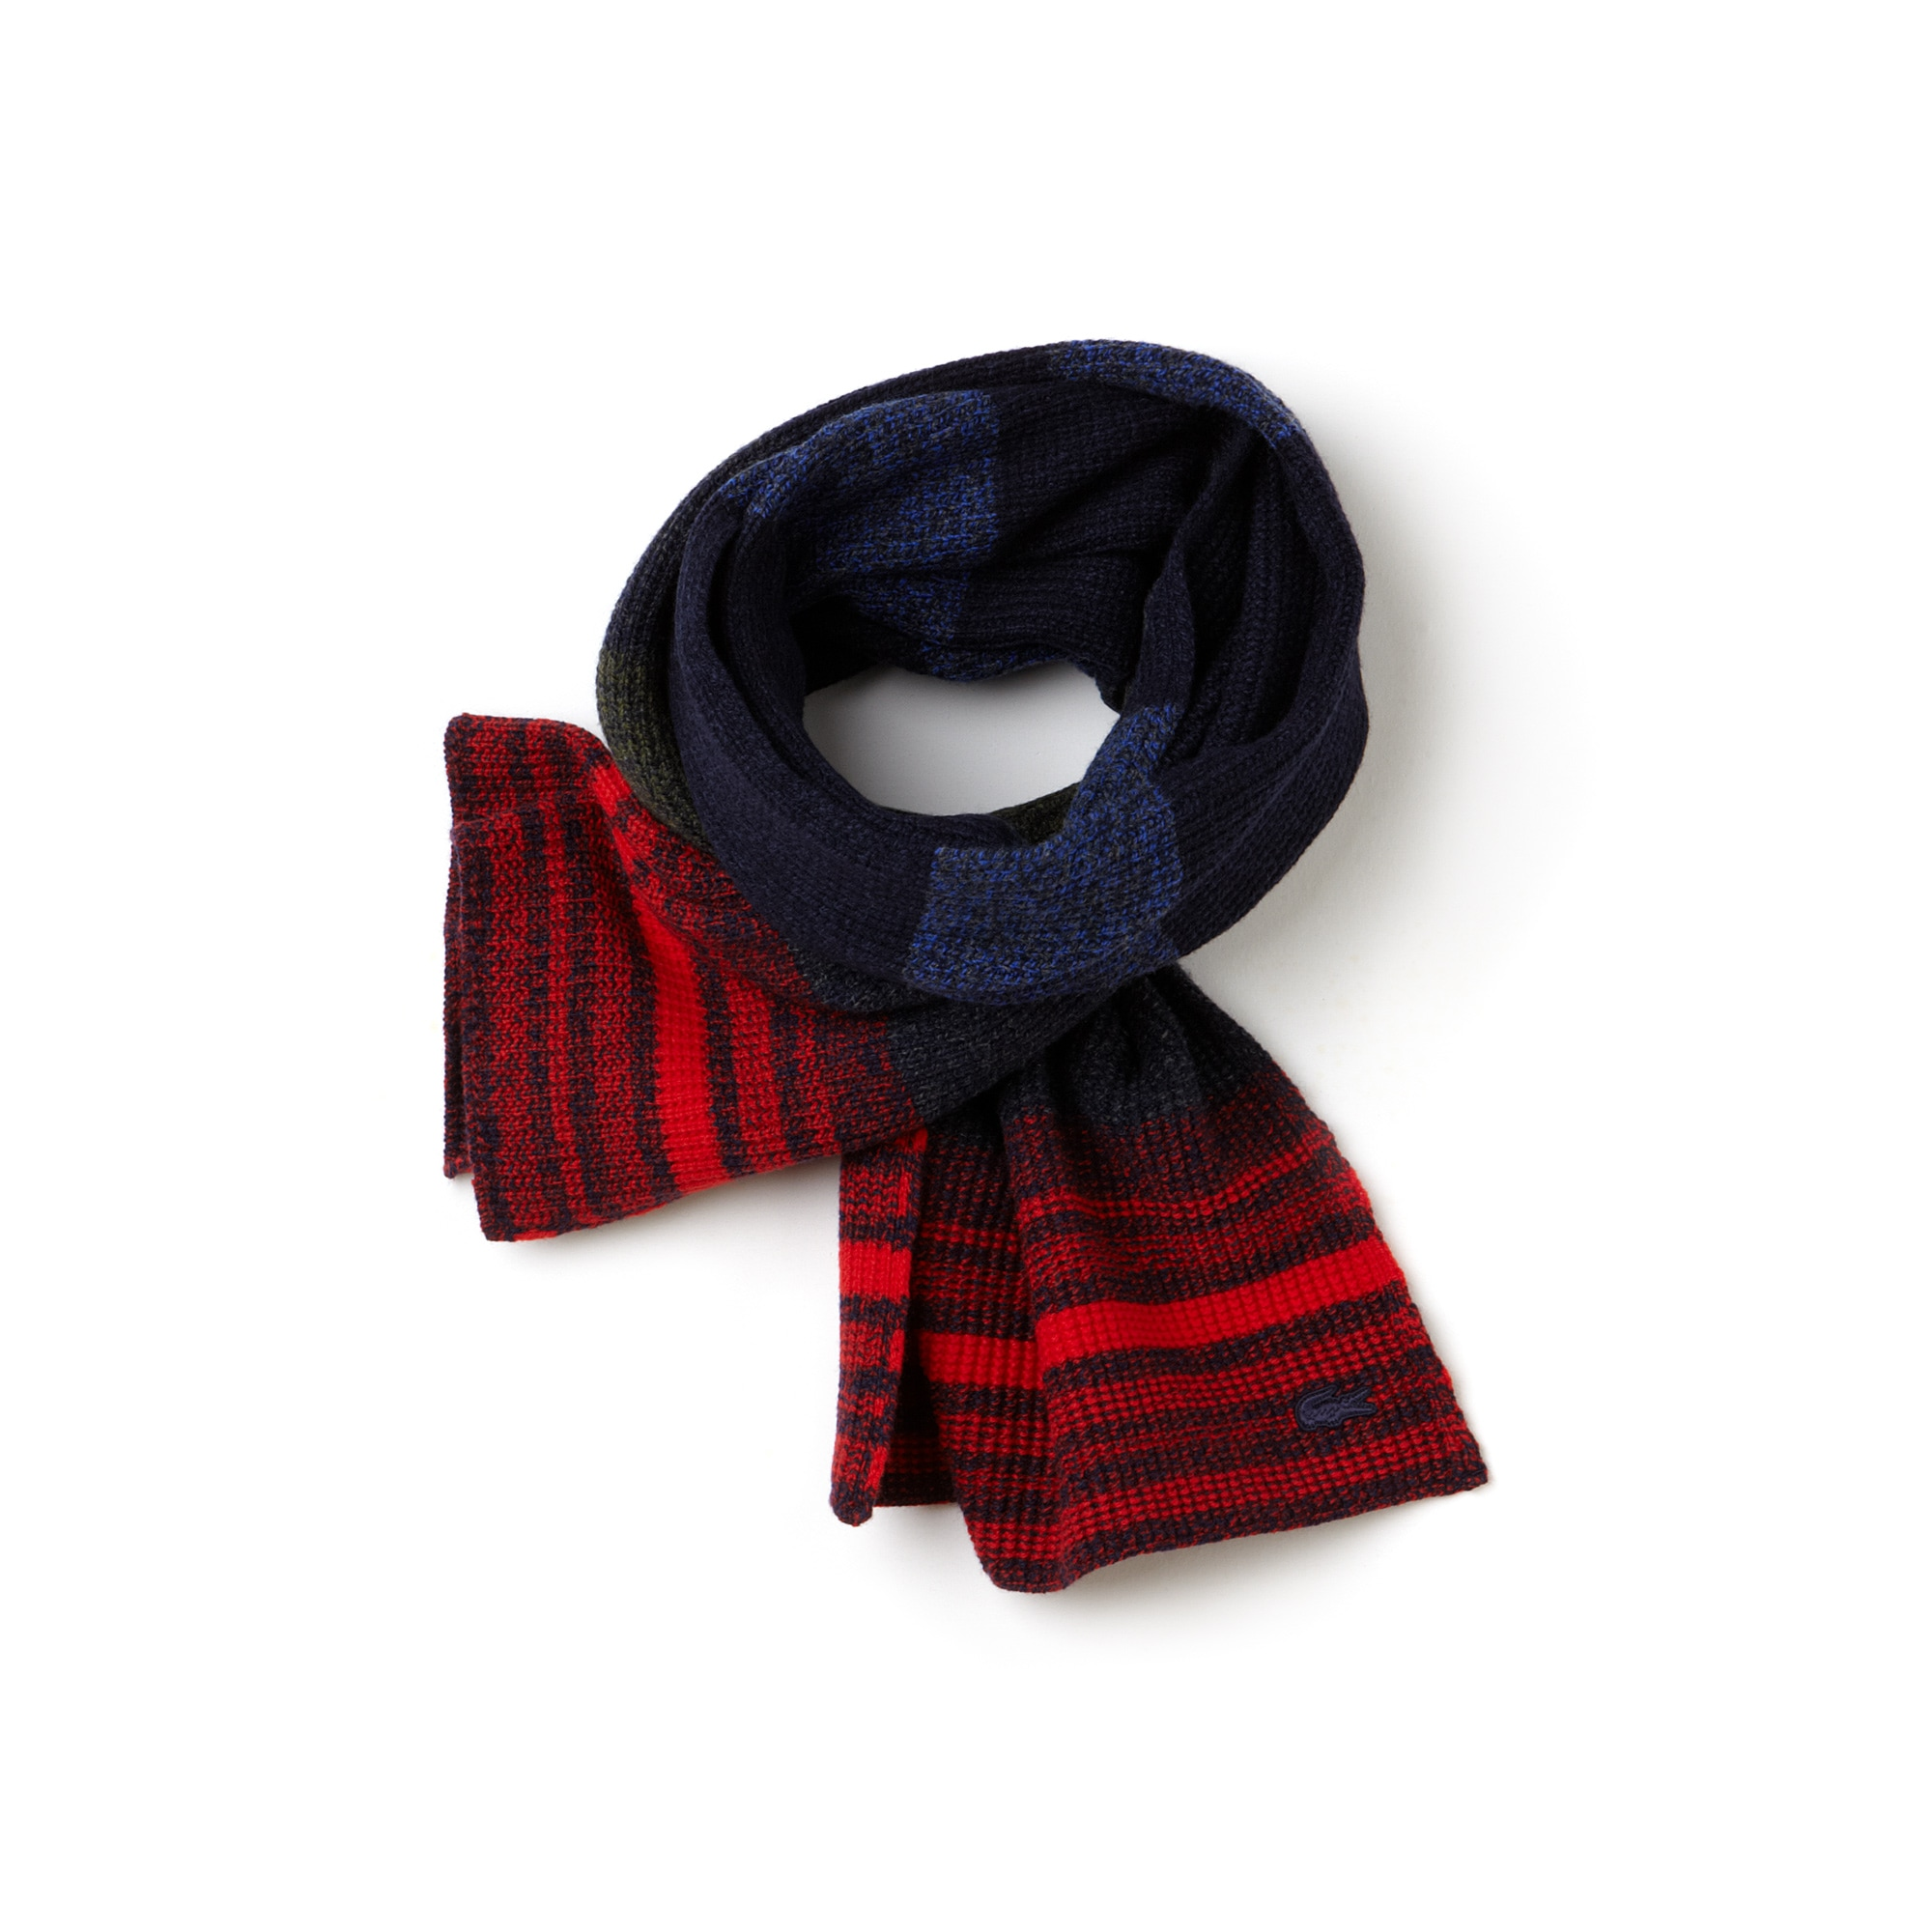 Women's Multicolored Striped Mouliné Jersey Scarf